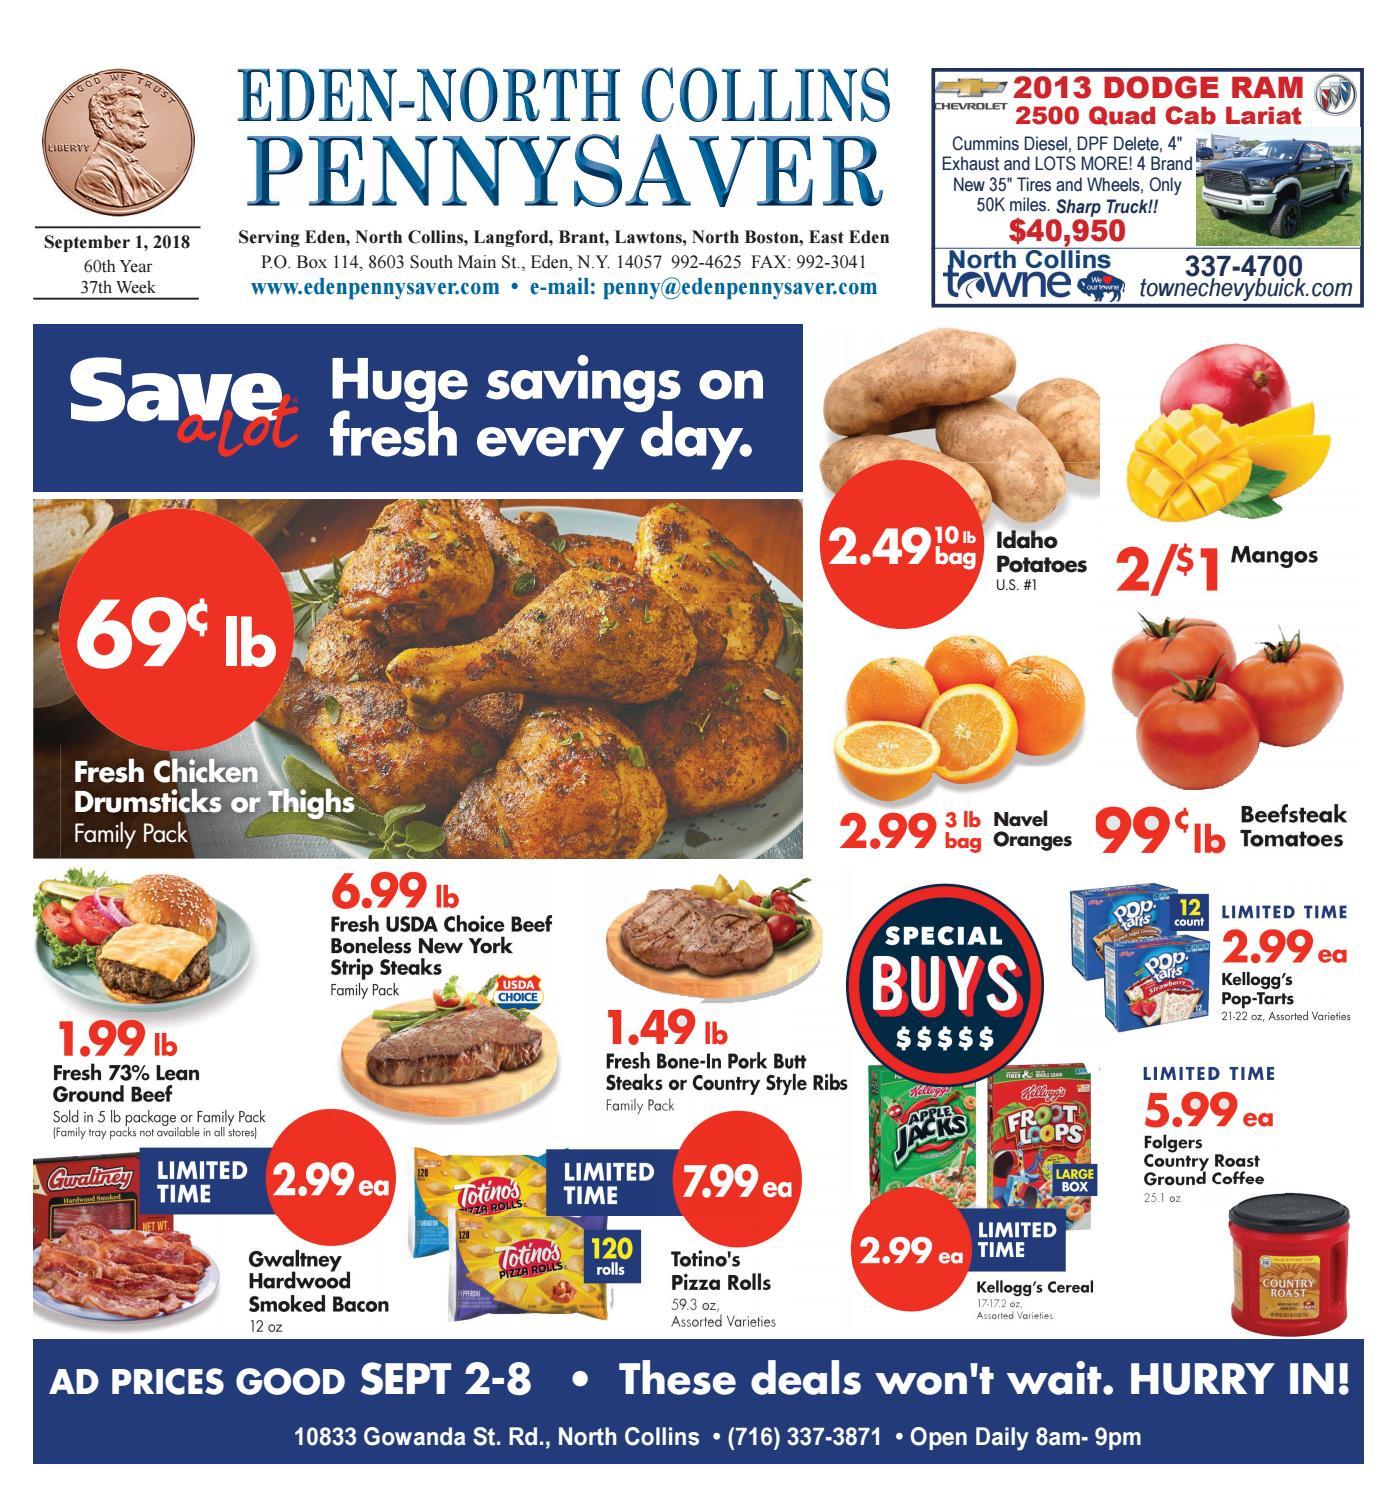 Eden- North Collins Pennysaver 9-1-18 by Eden- North Collins